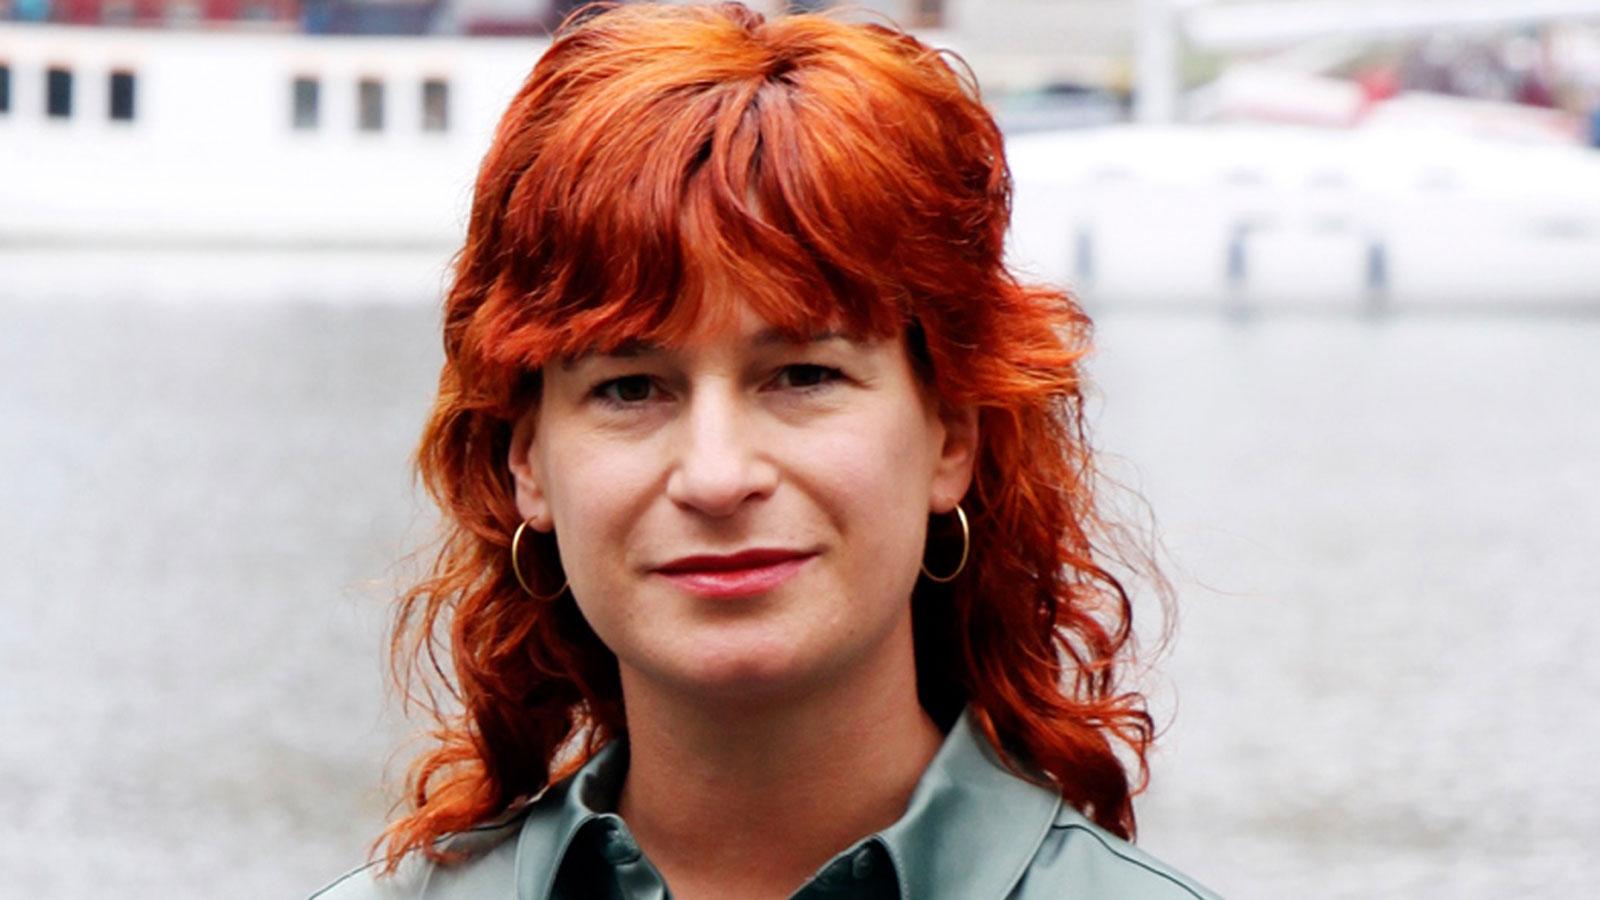 www svart kön pic com